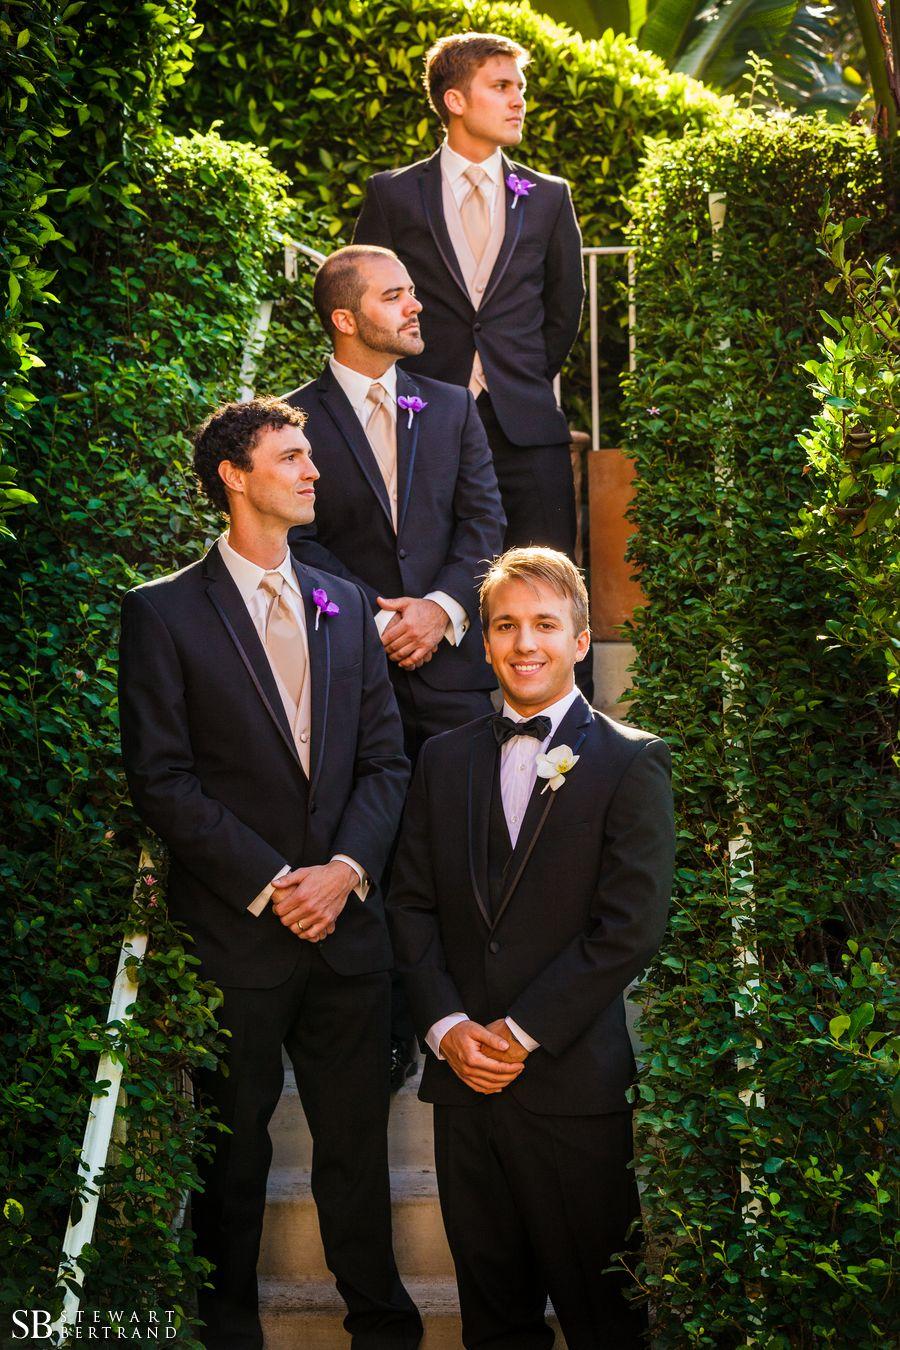 0024-La-Valencia-Wedding-Stewart-Bertrand-Photography-fe13.jpg